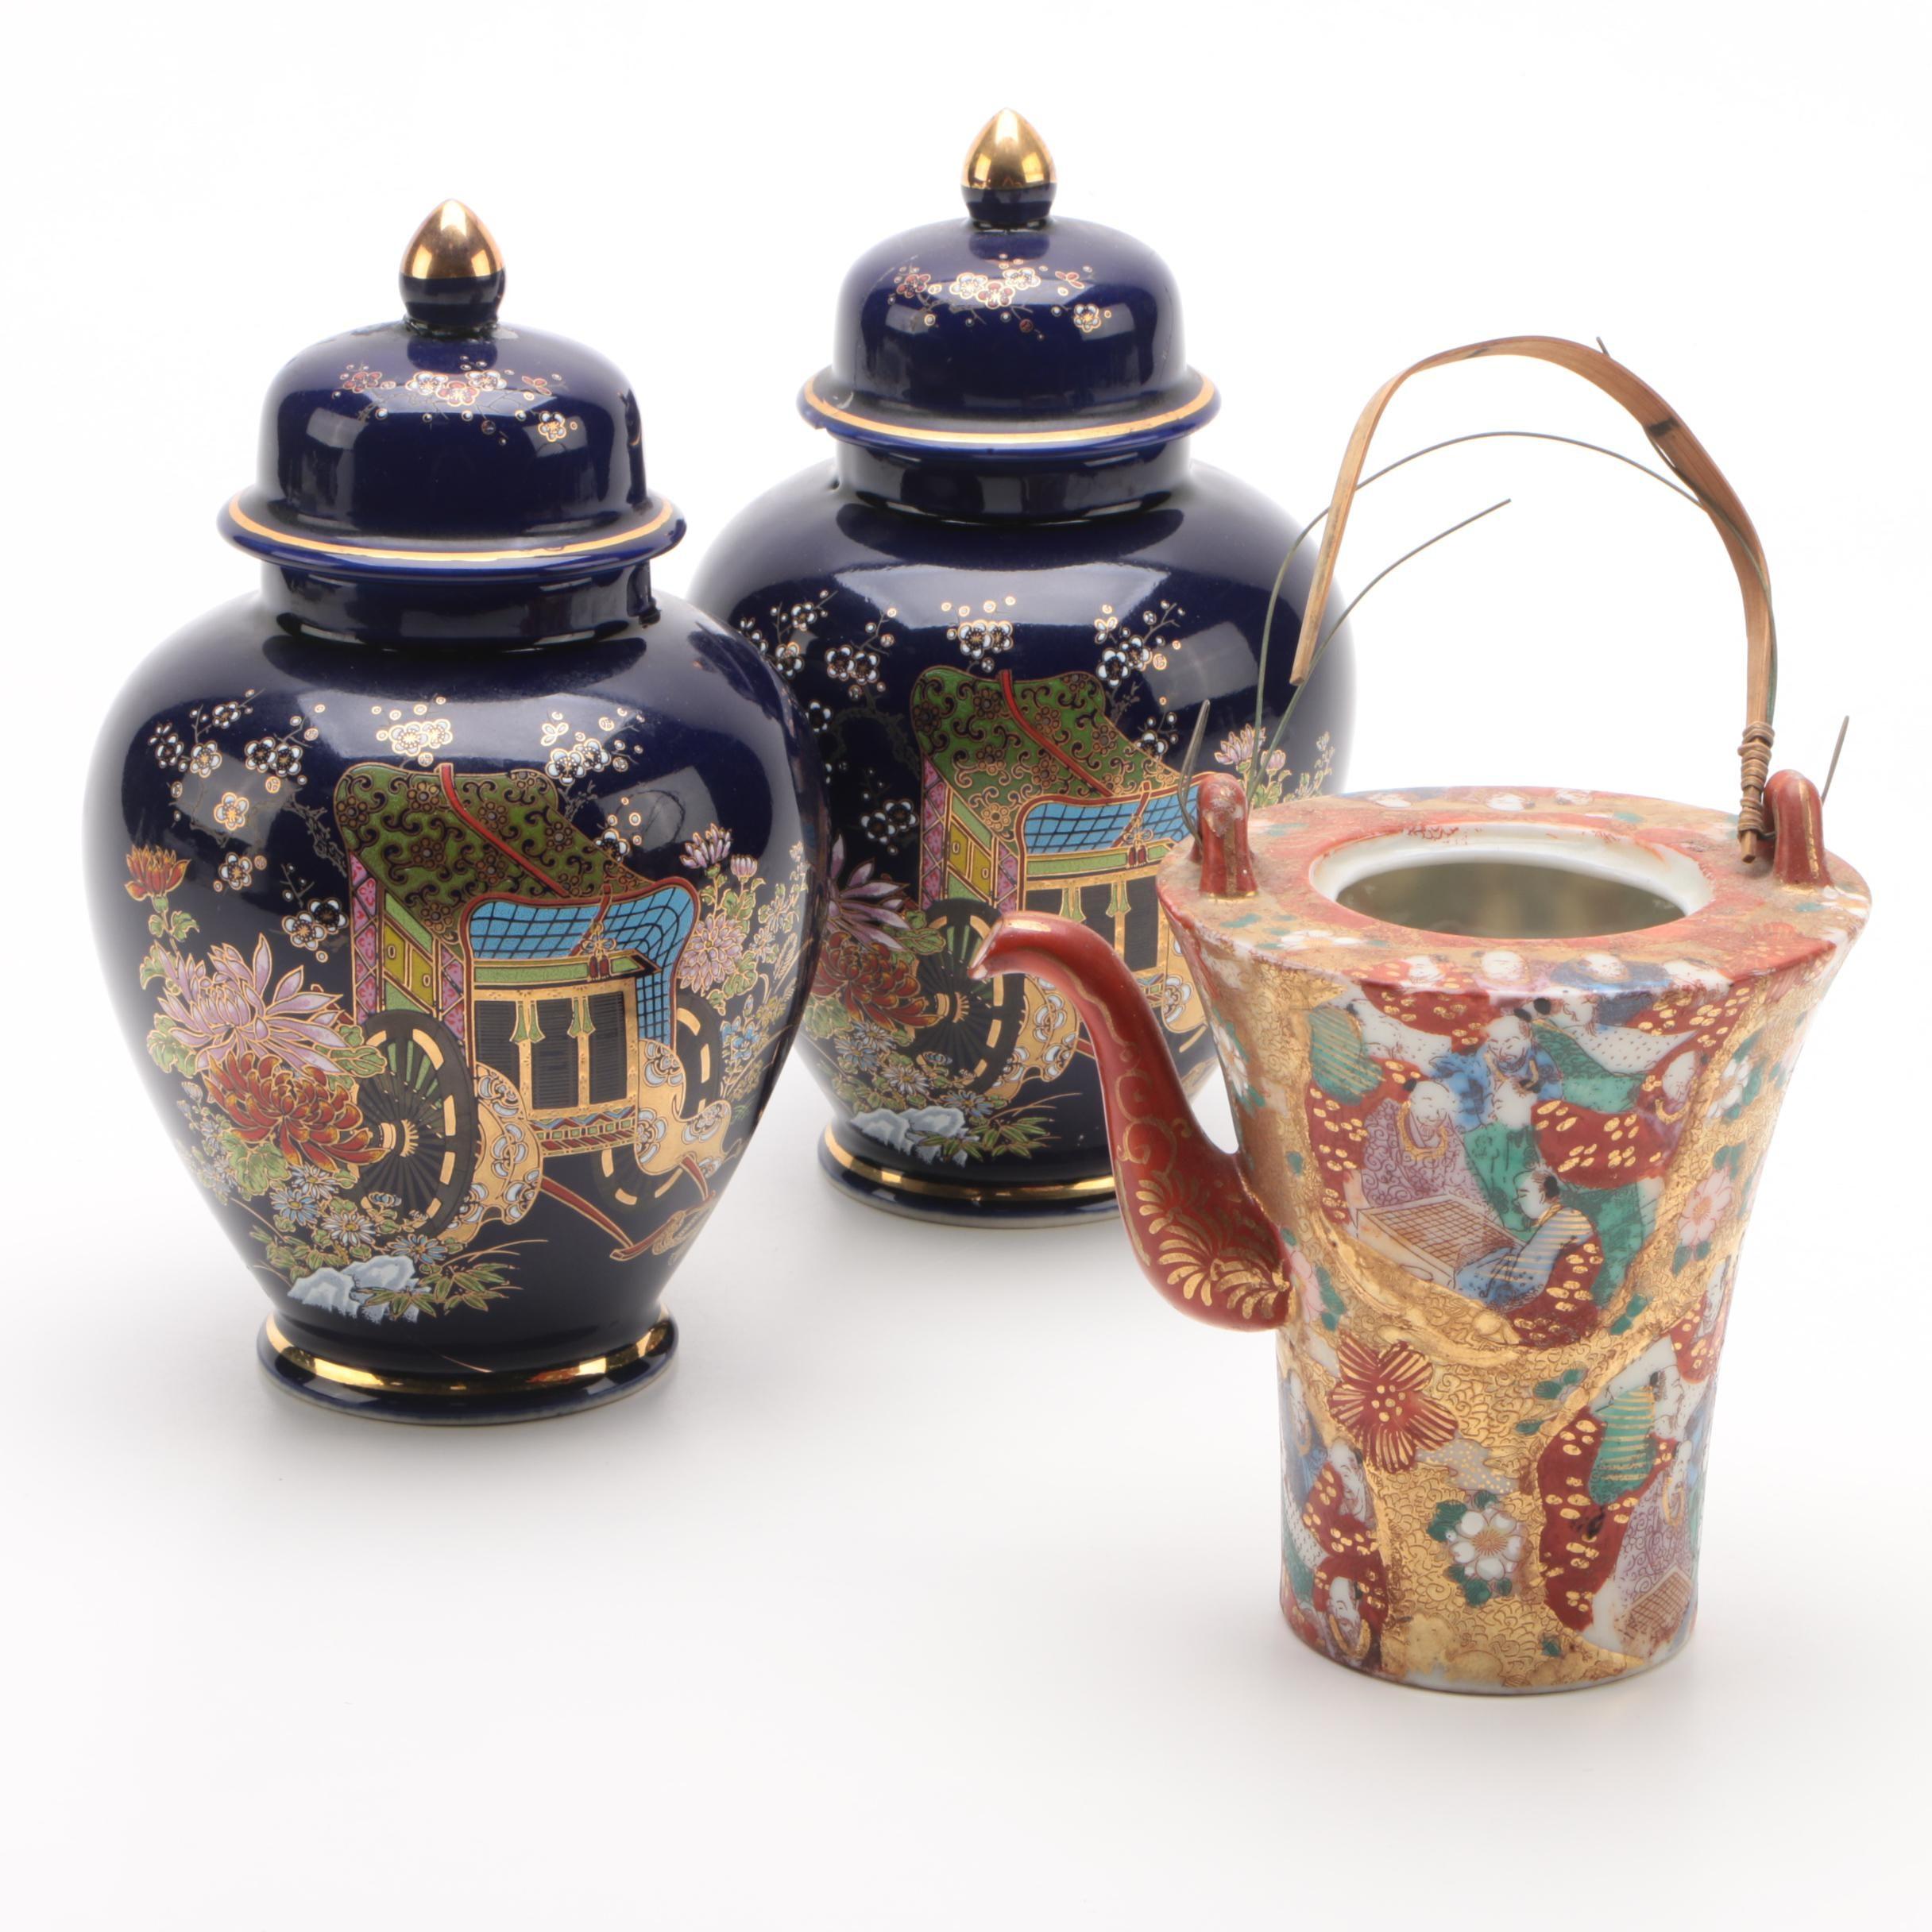 Japanese Porcelain Ginger Jars with Kutani Porcelain Teapot